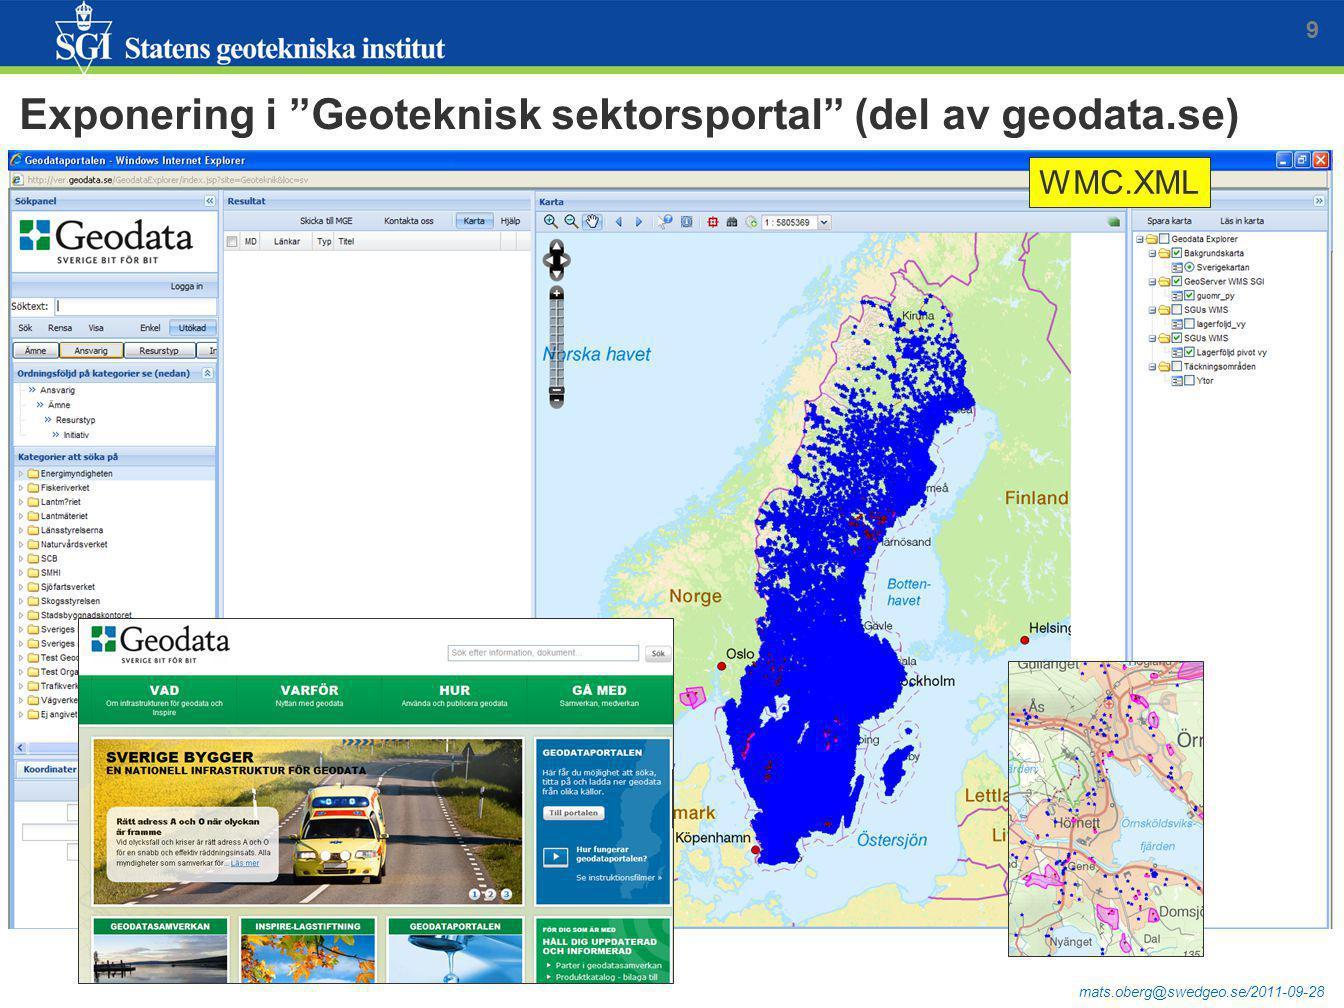 "mats.oberg@swedgeo.se/2011-09-28 Exponering i ""Geoteknisk sektorsportal"" (del av geodata.se) 9 WMC.XML"